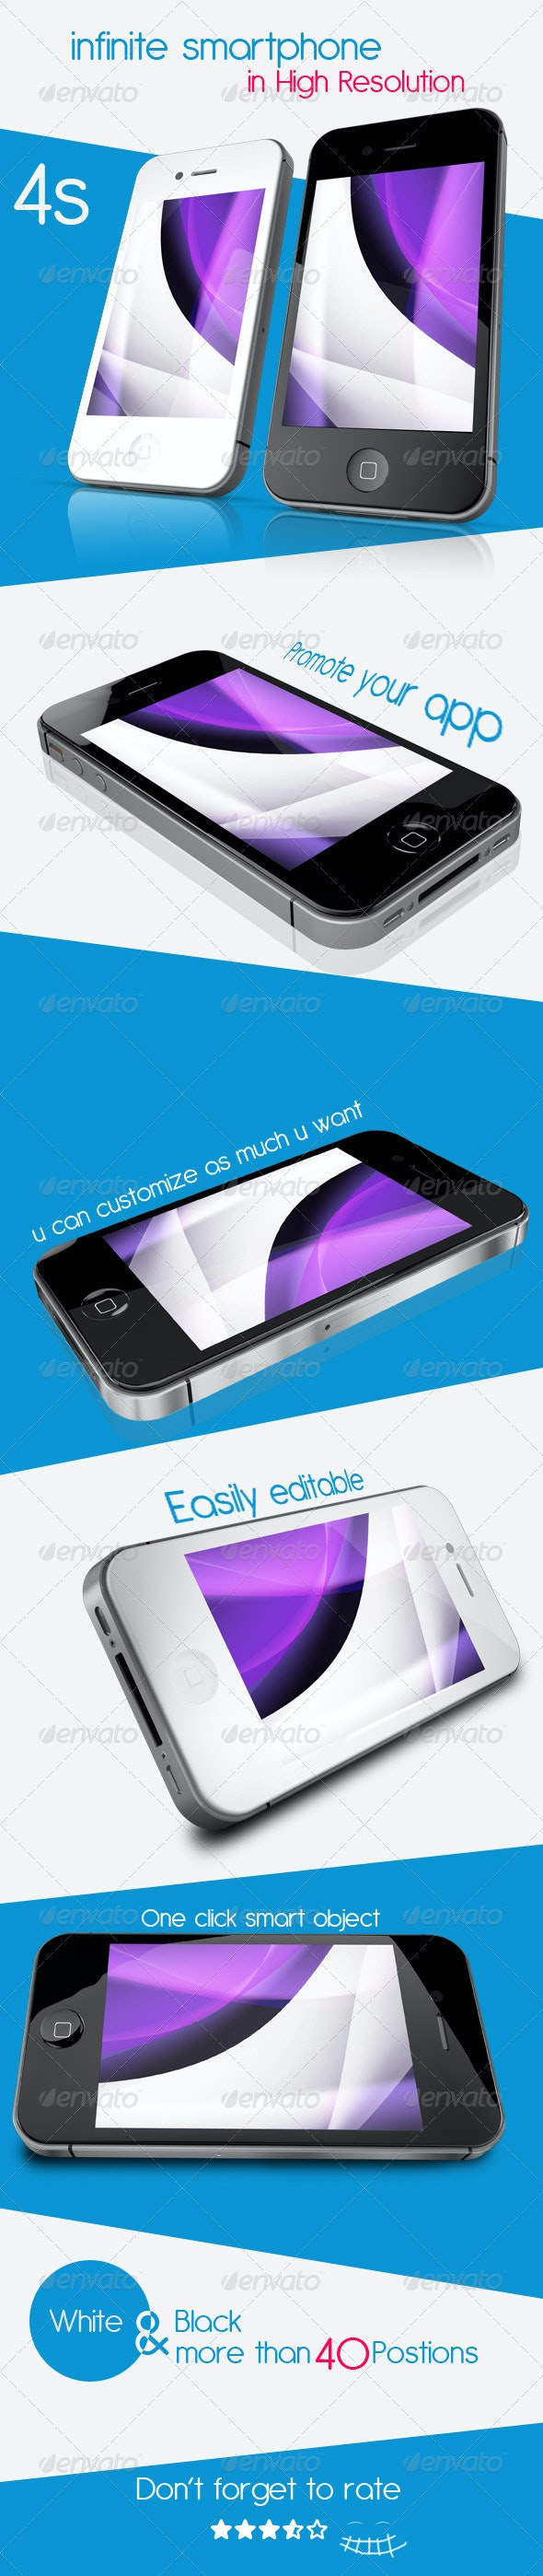 Infinite Smartphone - Mobile Displays